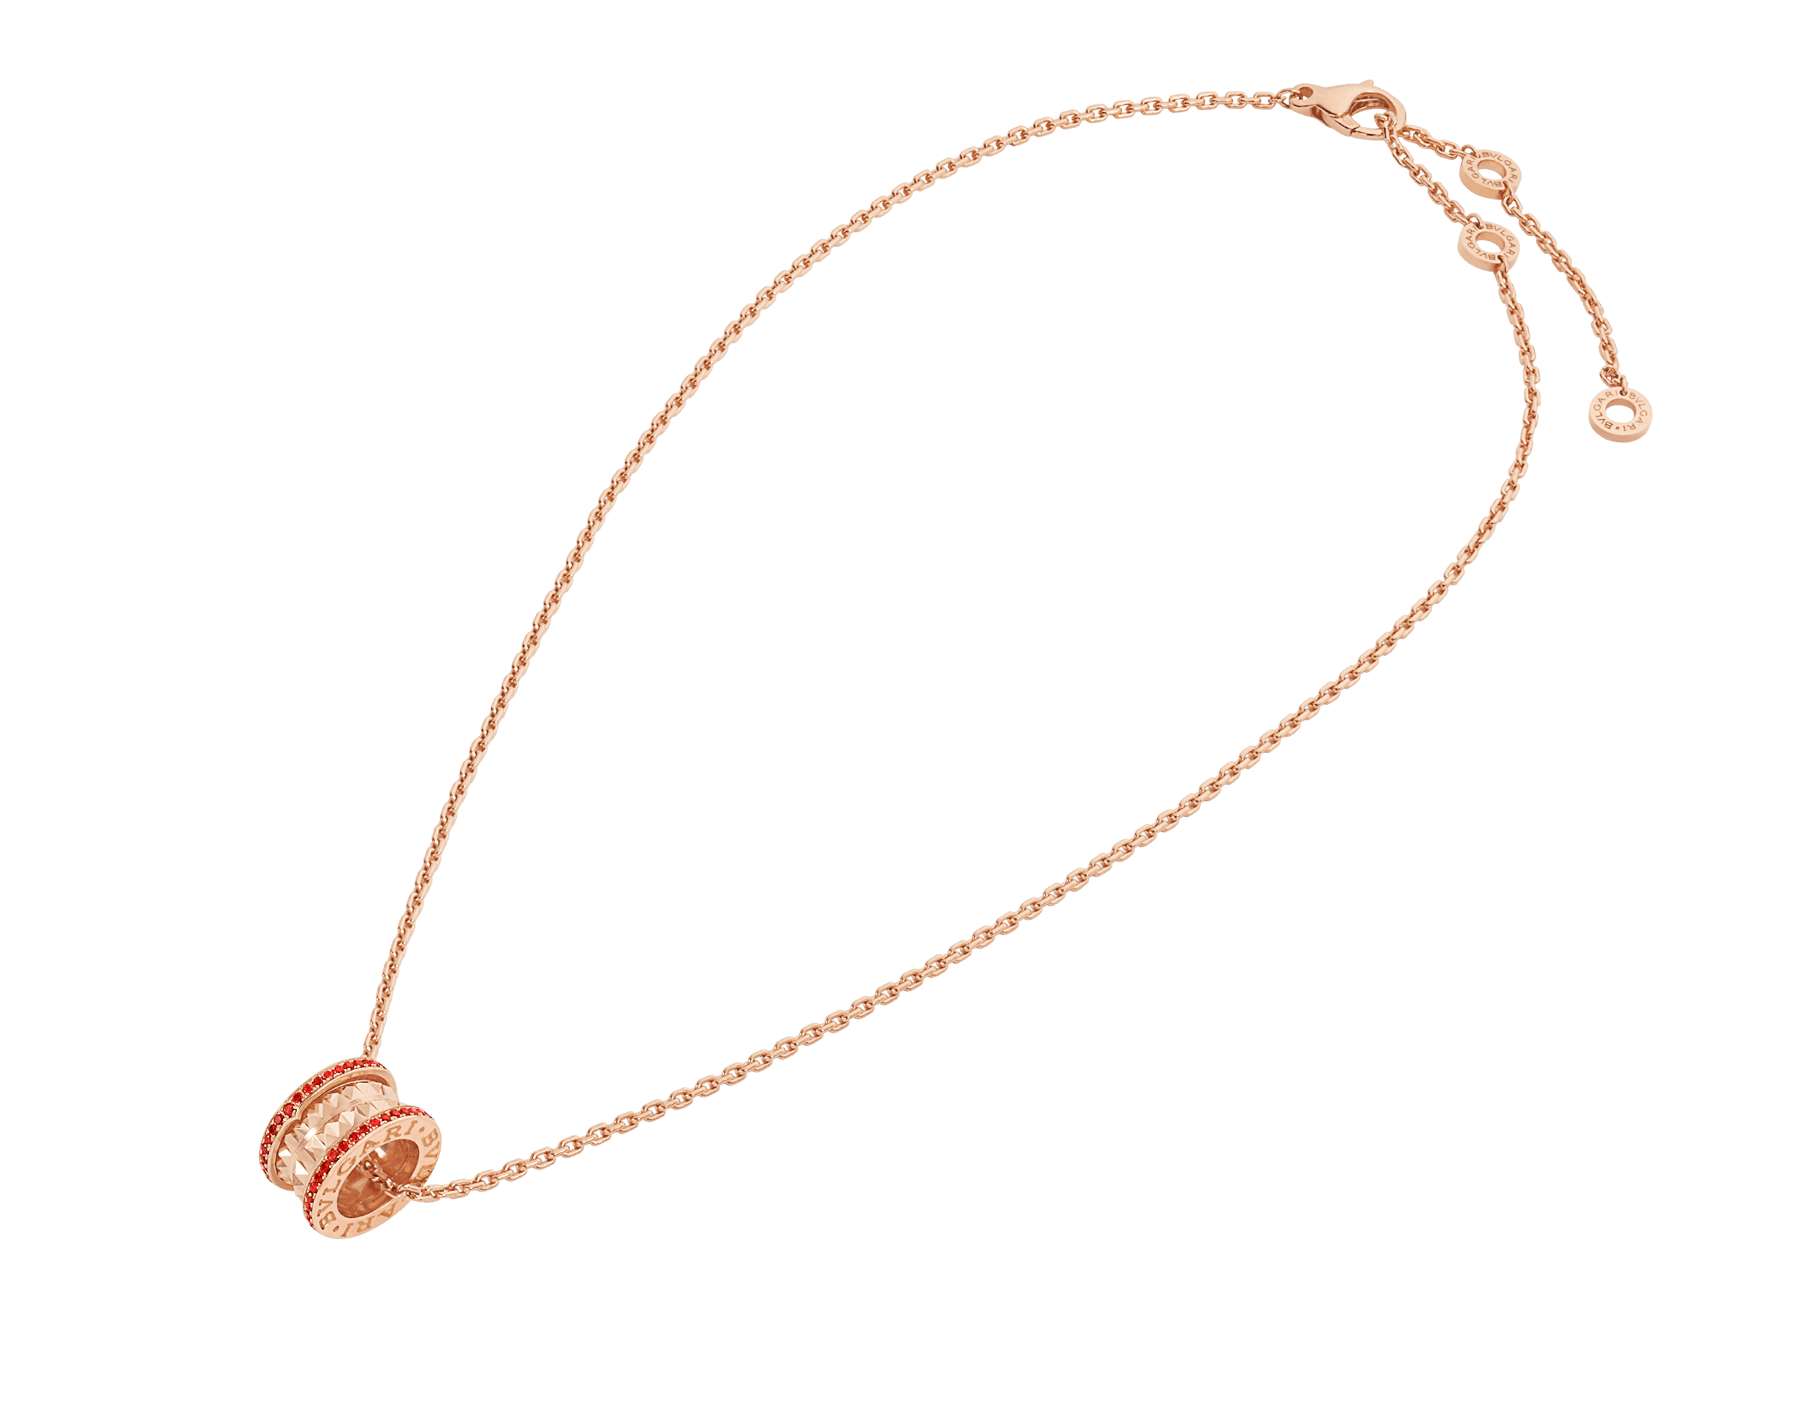 BVLGARI BVLGARI 18K 玫瑰金翻轉式戒指,鑲飾翡翠和密鑲鑽石。 358306 image 2